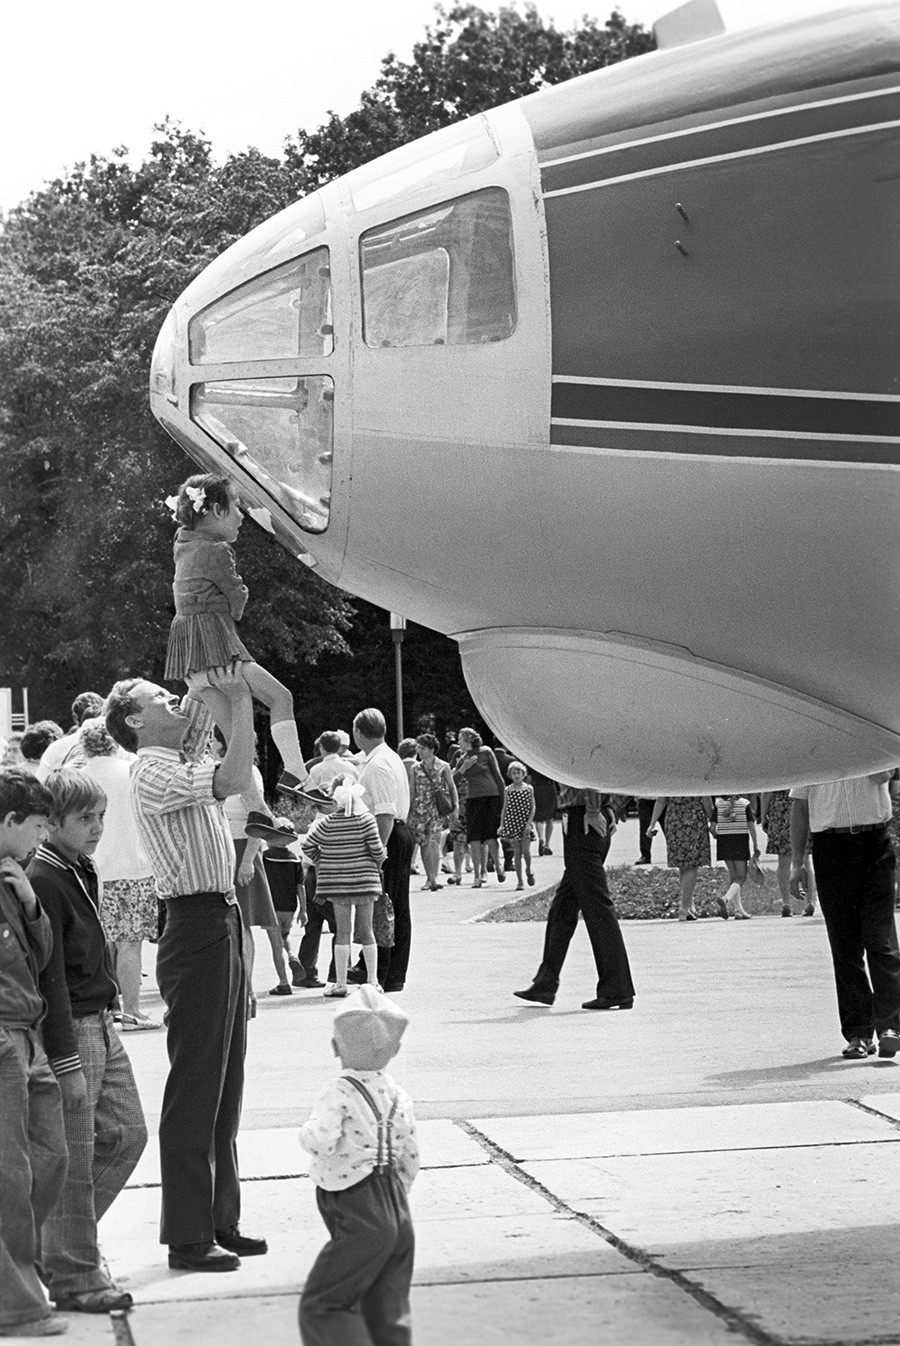 Pesawat bioskop Antoshka di Taman Yuri Gagarin, Kuibyshev (sekarang Samara), 1977.